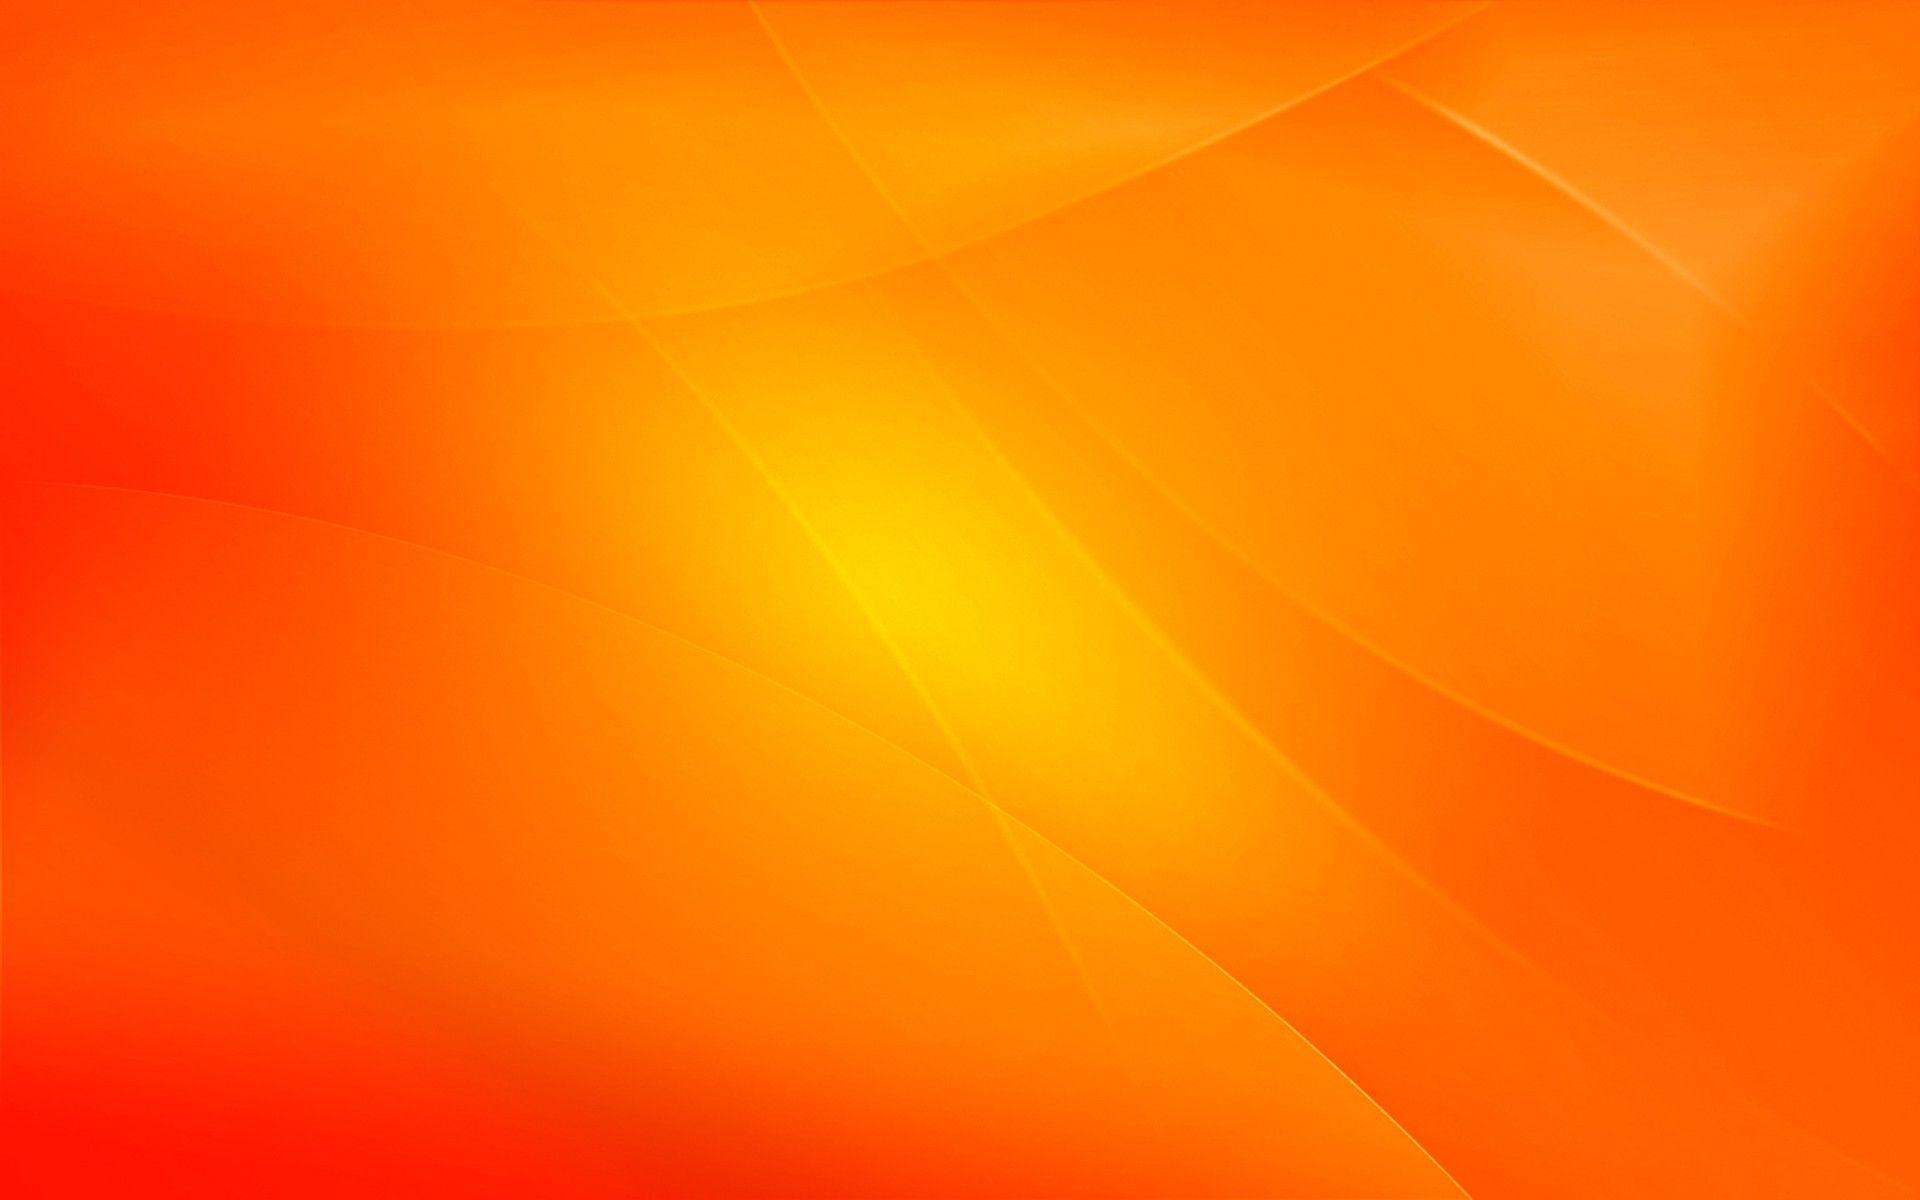 orange wallpaper06 - photo #8